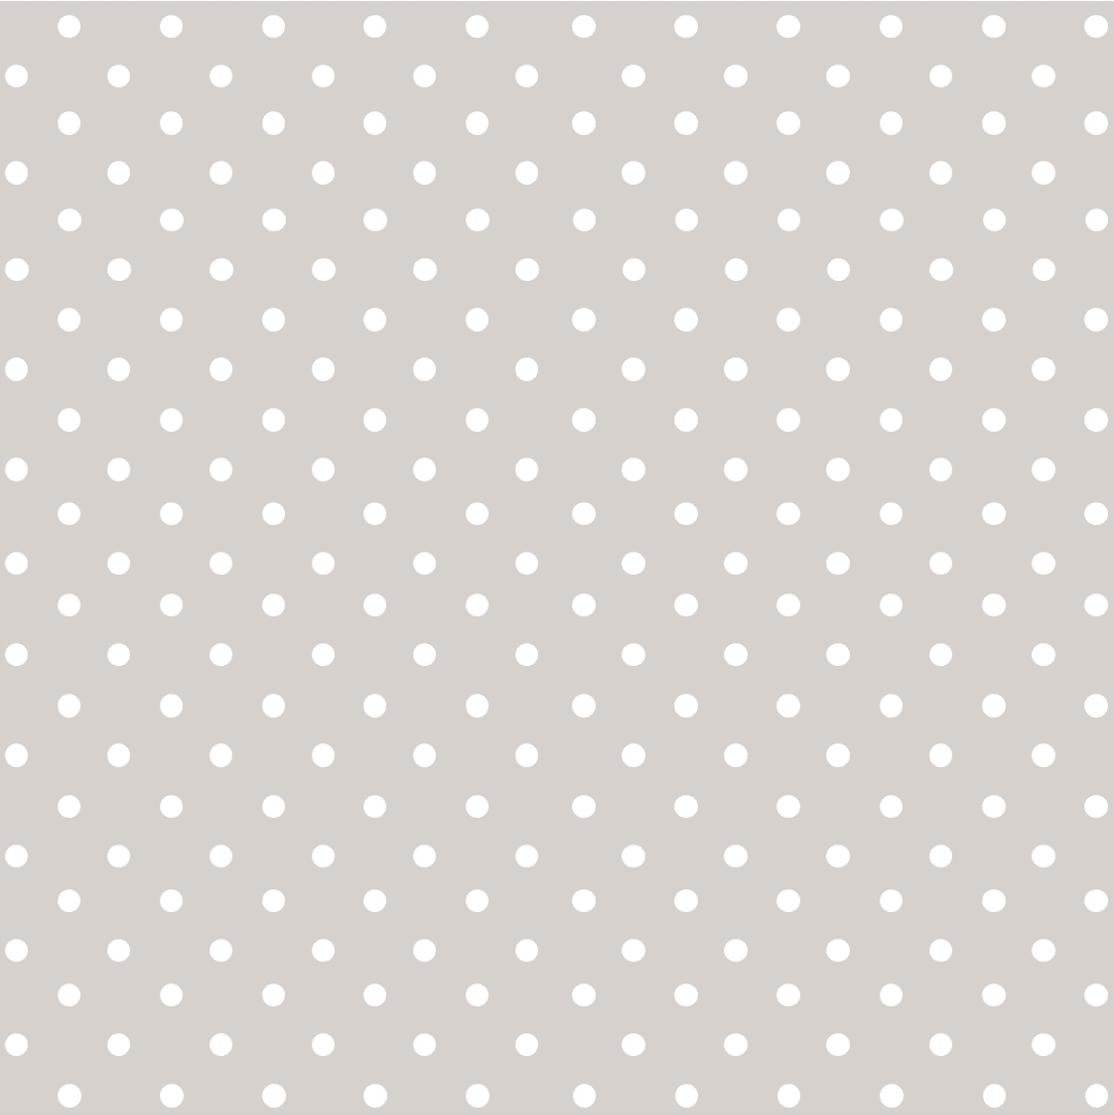 Mantel LUNARES en BEIGE Rectangular 1,8x2,7m [porconfeccionar] [listoen5·7días]